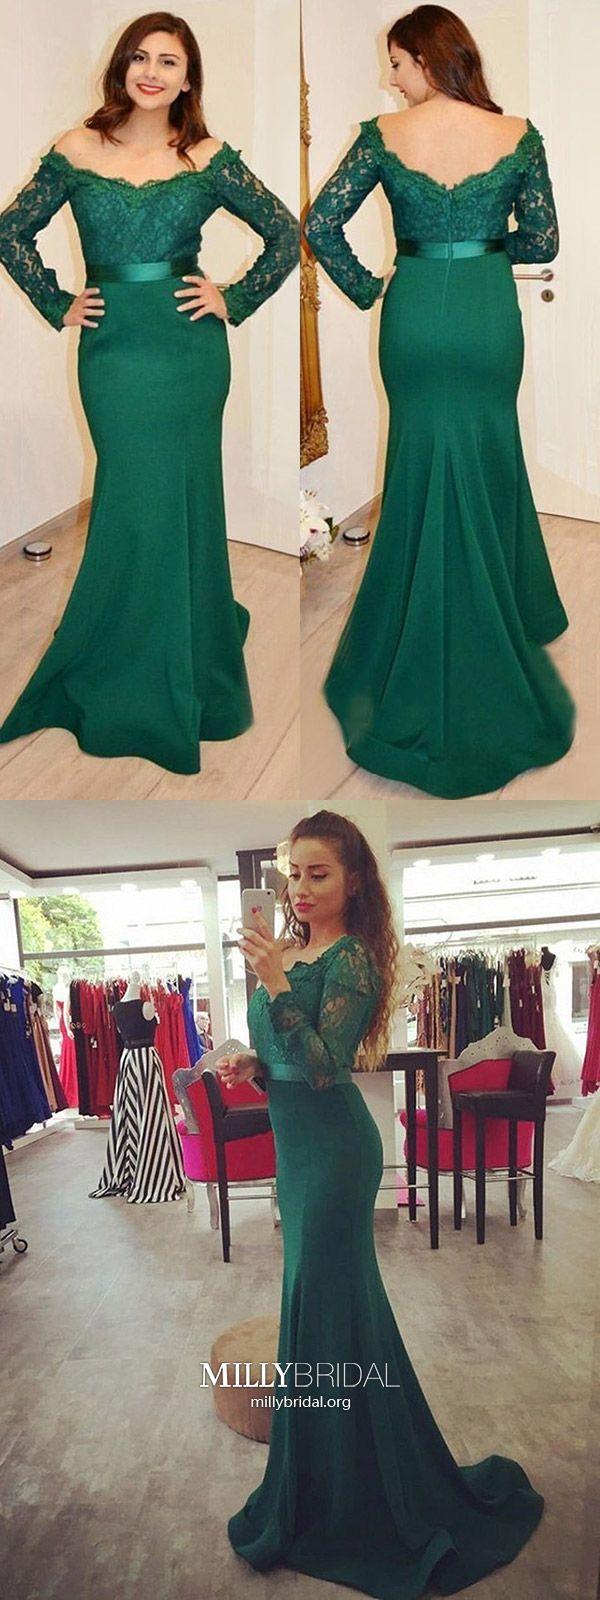 Long prom dresses with sleevesdark green prom dresses mermaid